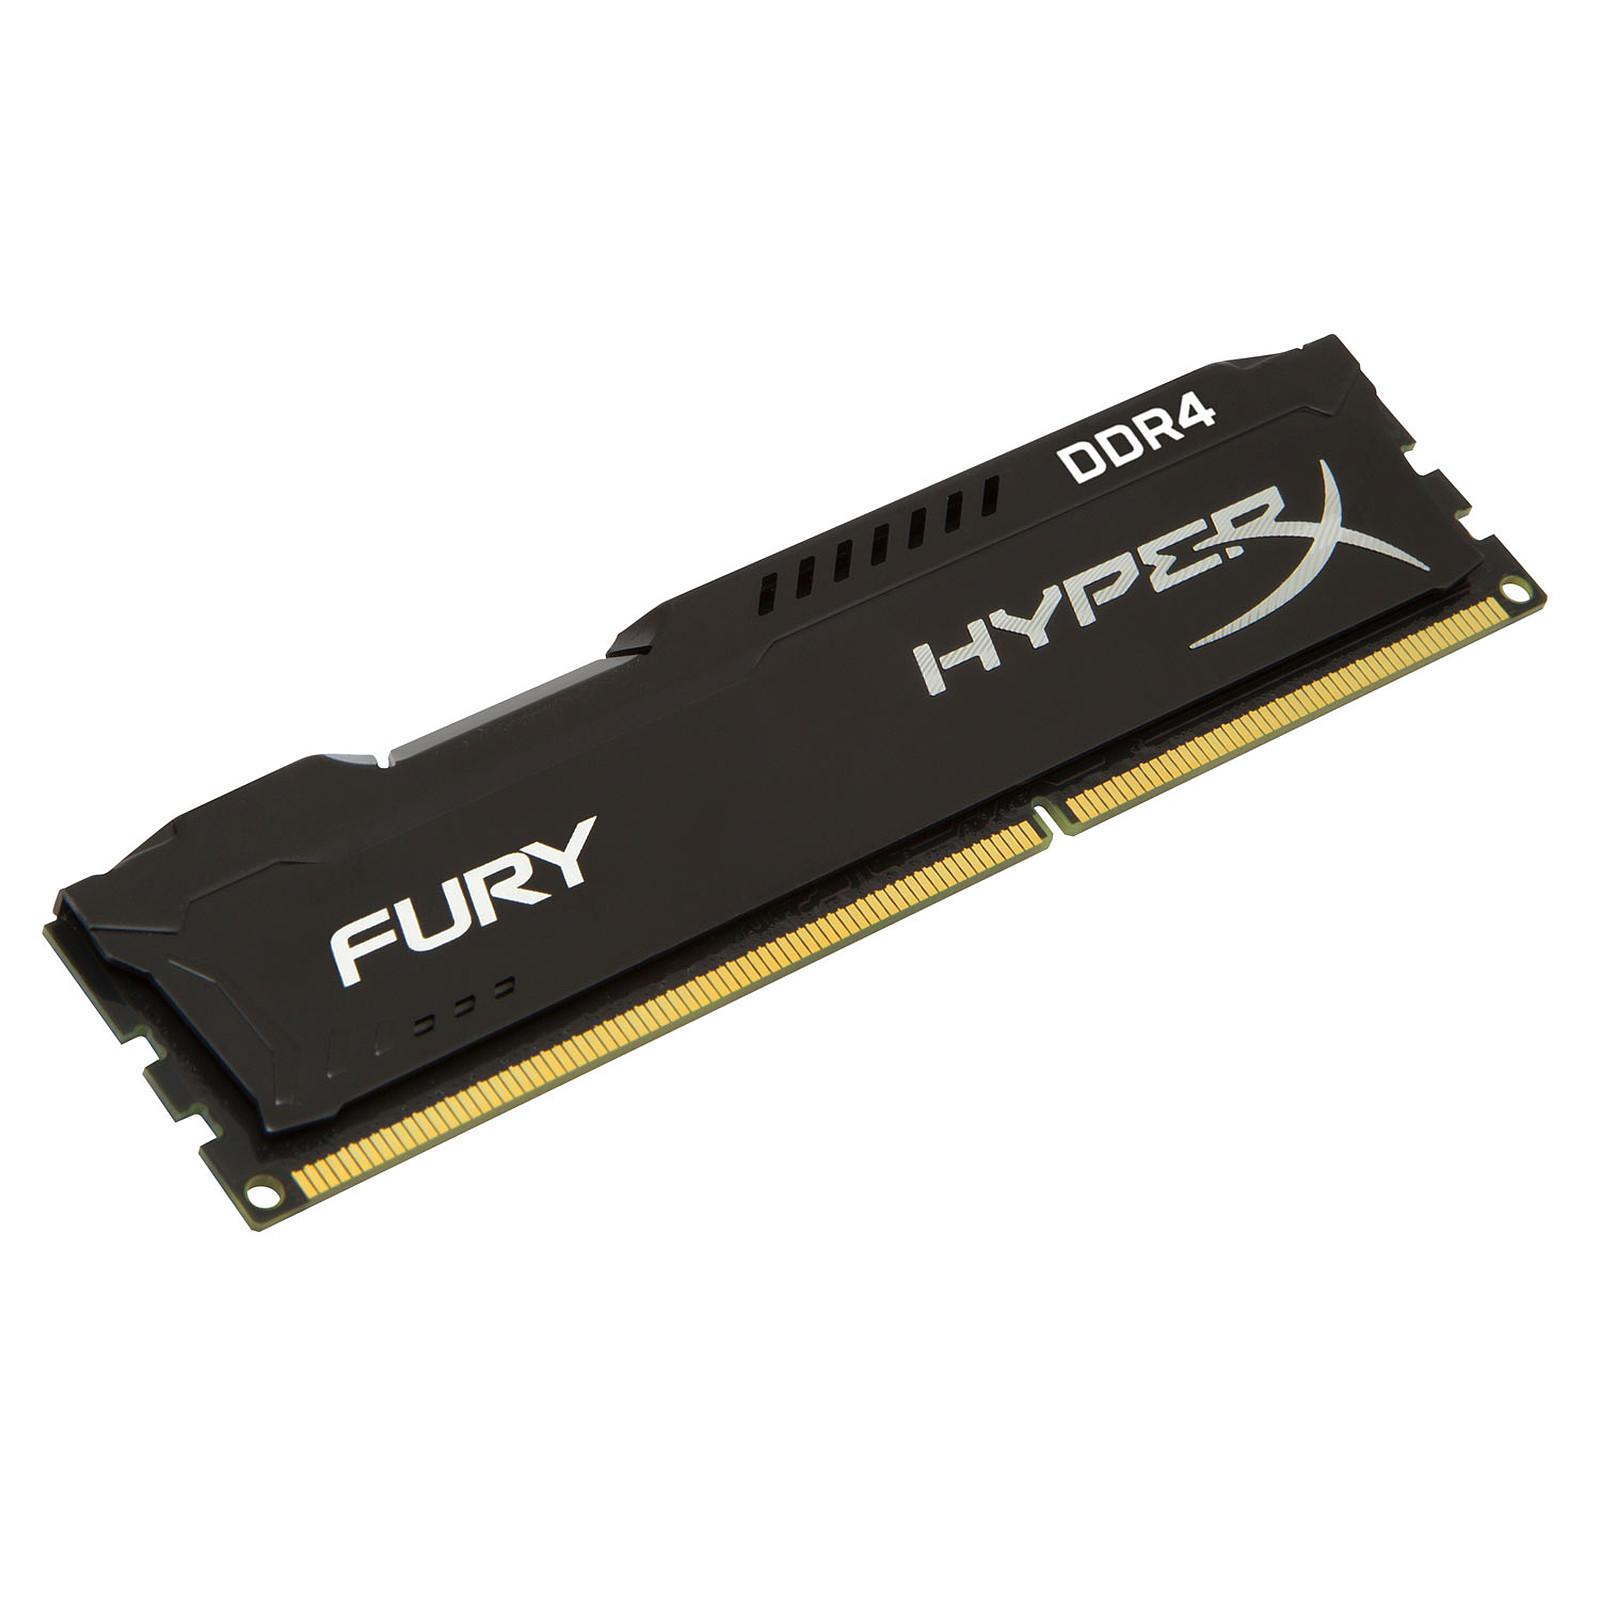 HyperX Fury Noir 16 Go DDR4 2933 MHz CL17